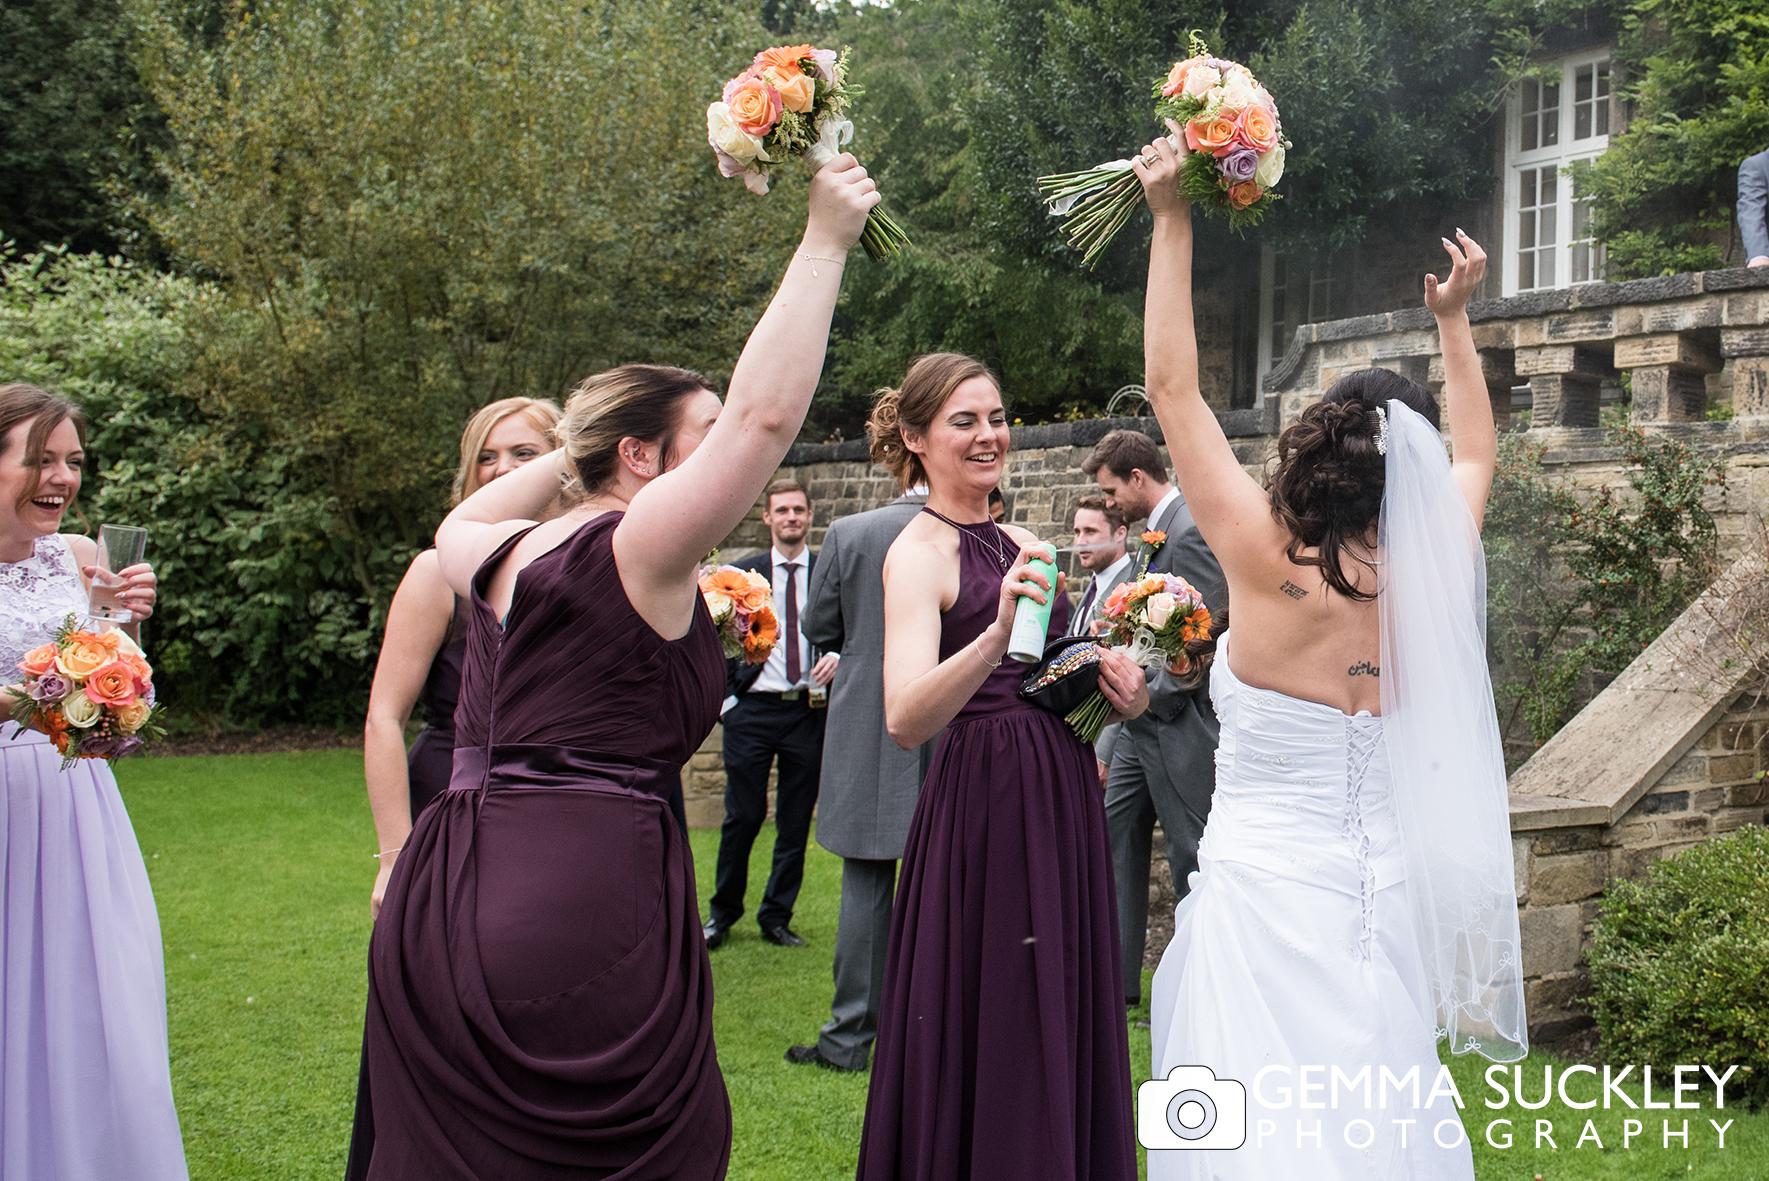 bride and bridesmaids at outdoor wedding spaying deodorant